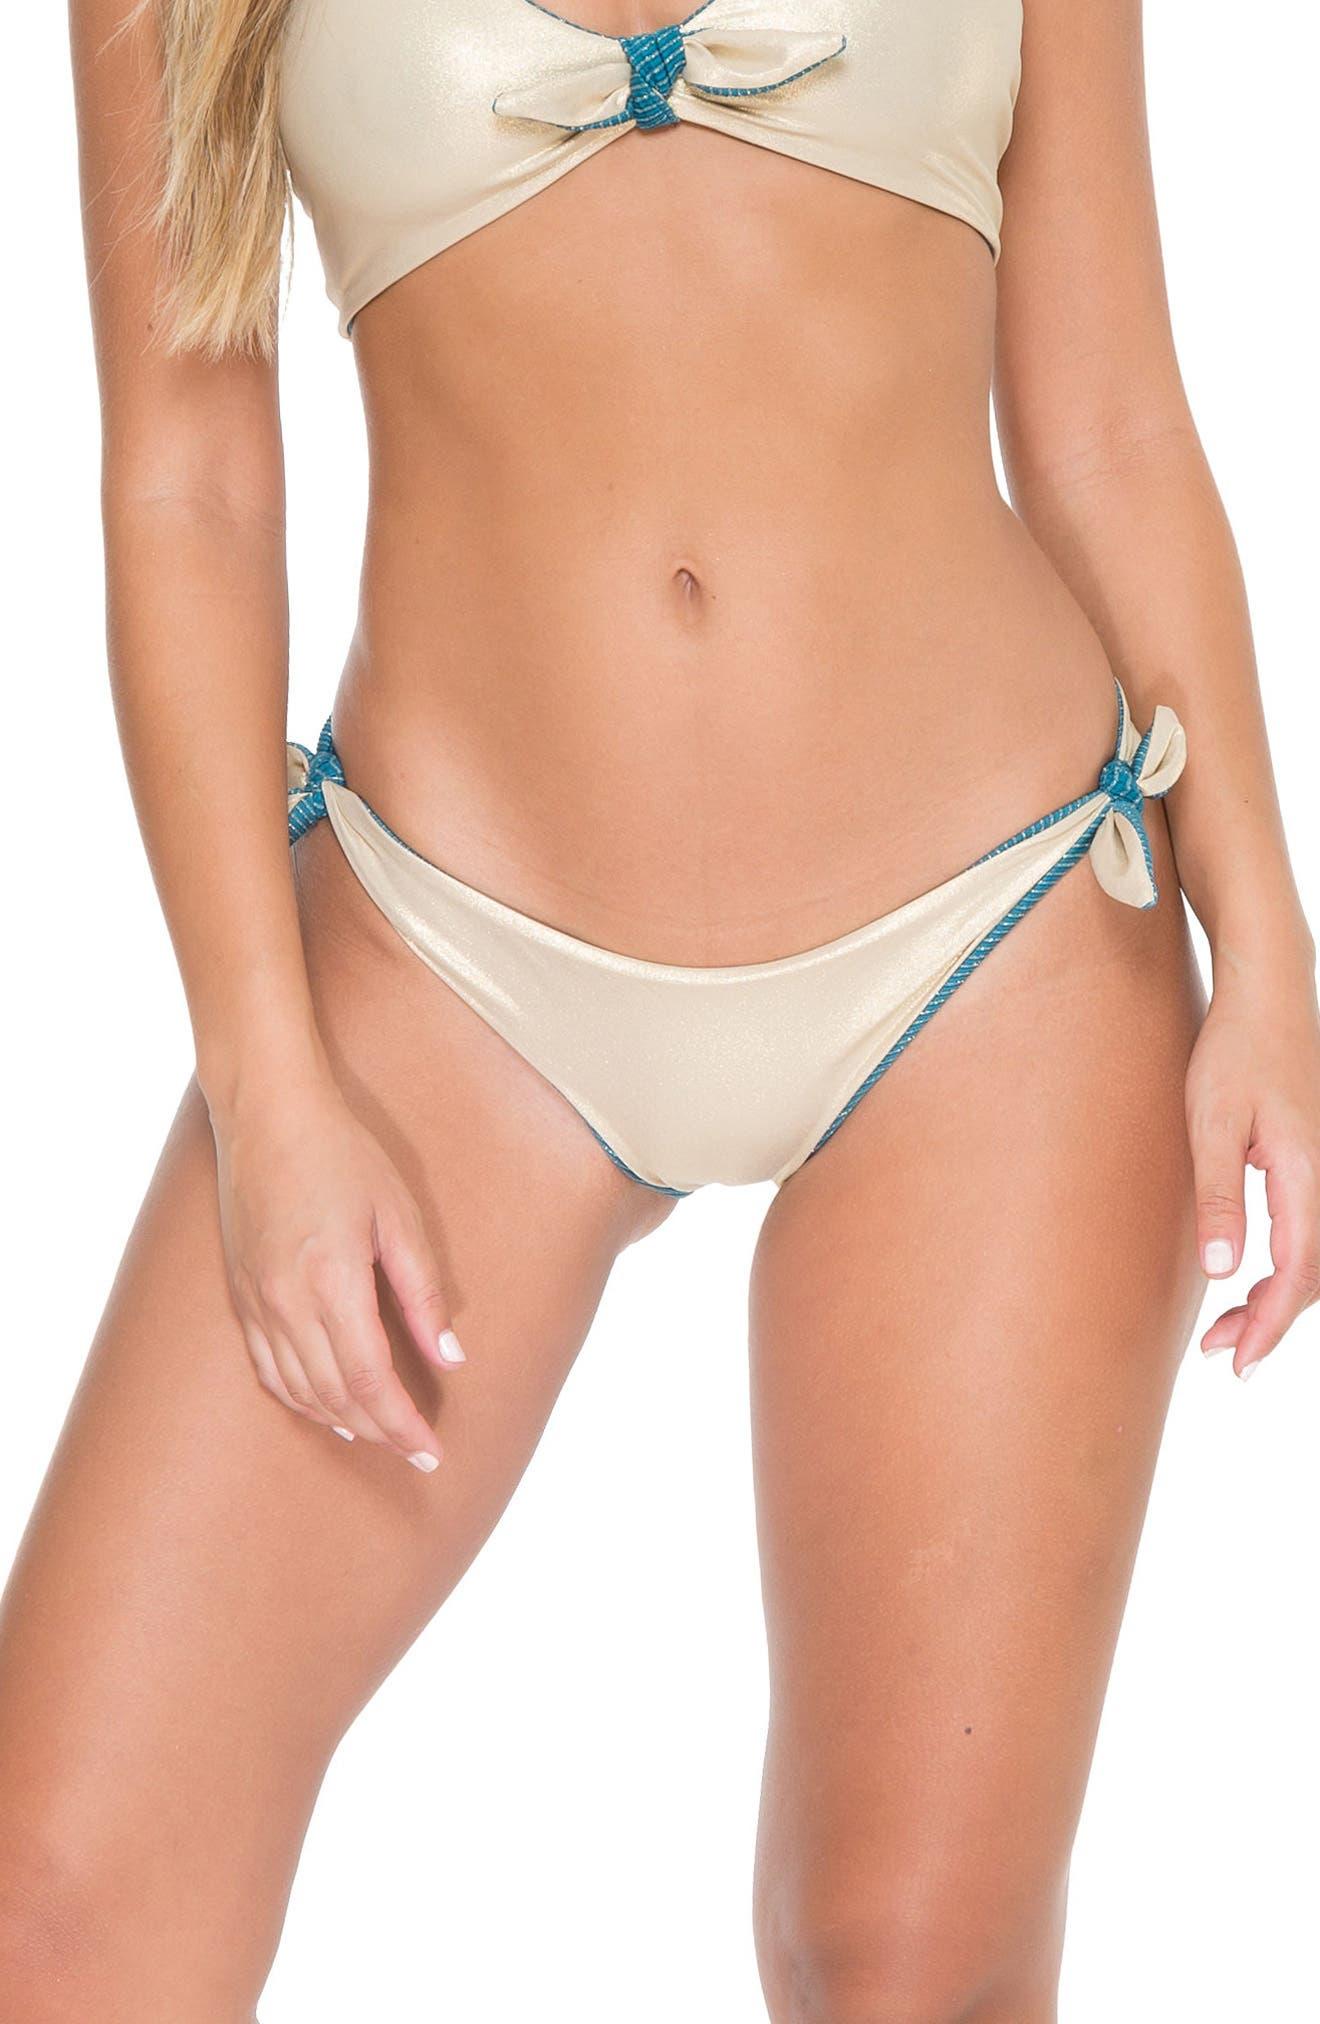 Cayo Hueso Reversible Bikini Bottoms,                             Alternate thumbnail 5, color,                             Miramar Blue/ Gold